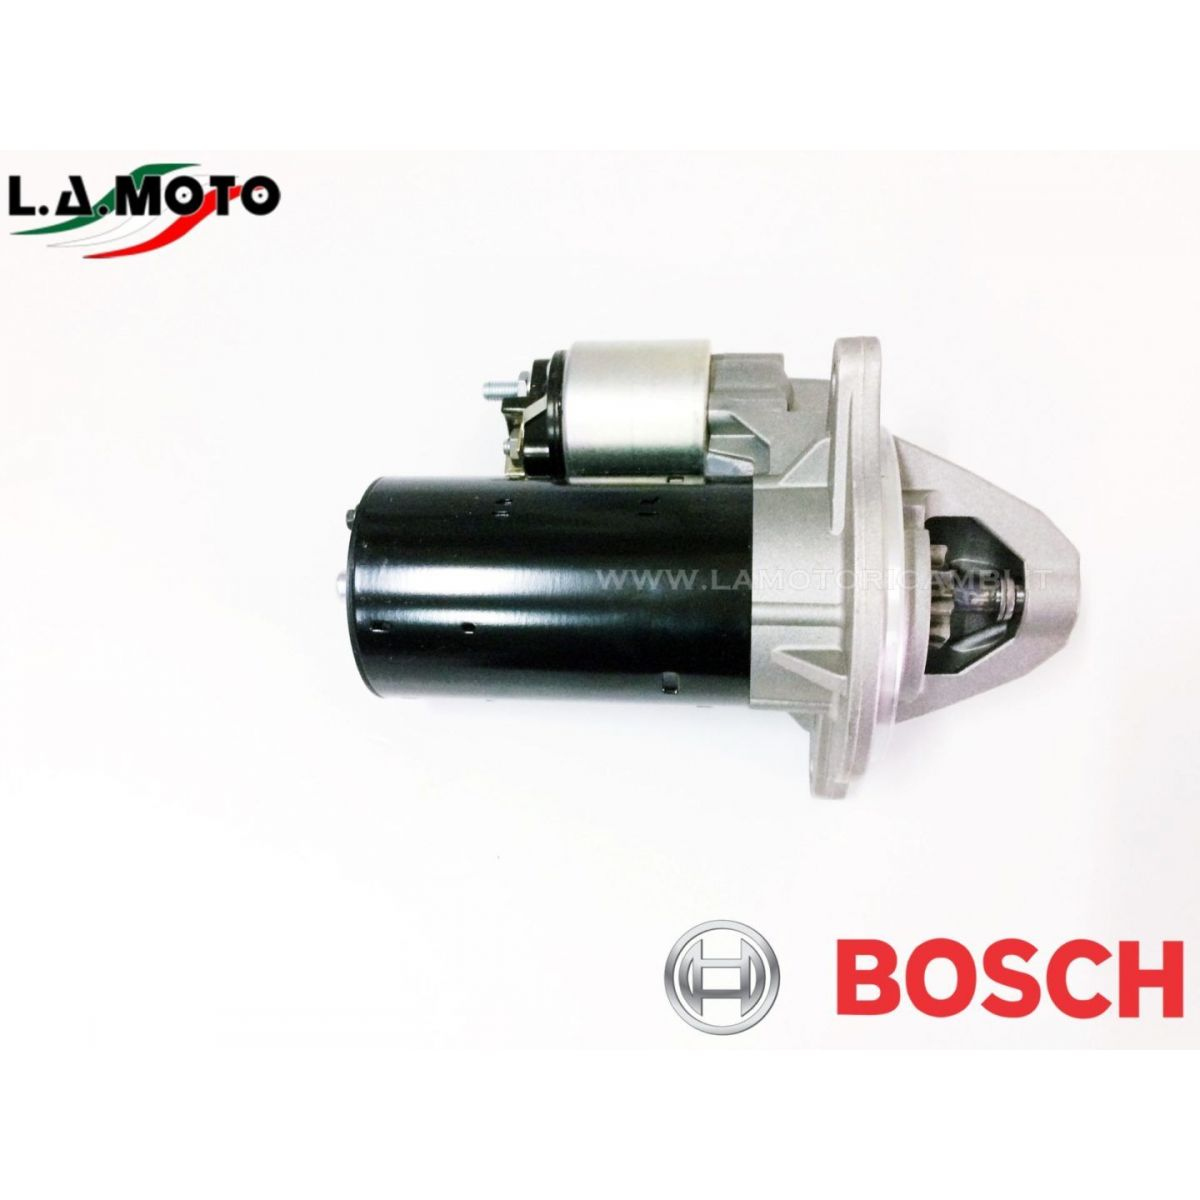 MOTORINO D'AVVIAMENTO BOSCH 0001218774 PER IVECO DAILY-IVECO CITYCLASS-IVECO GRINTA-IVECO SCUDATO